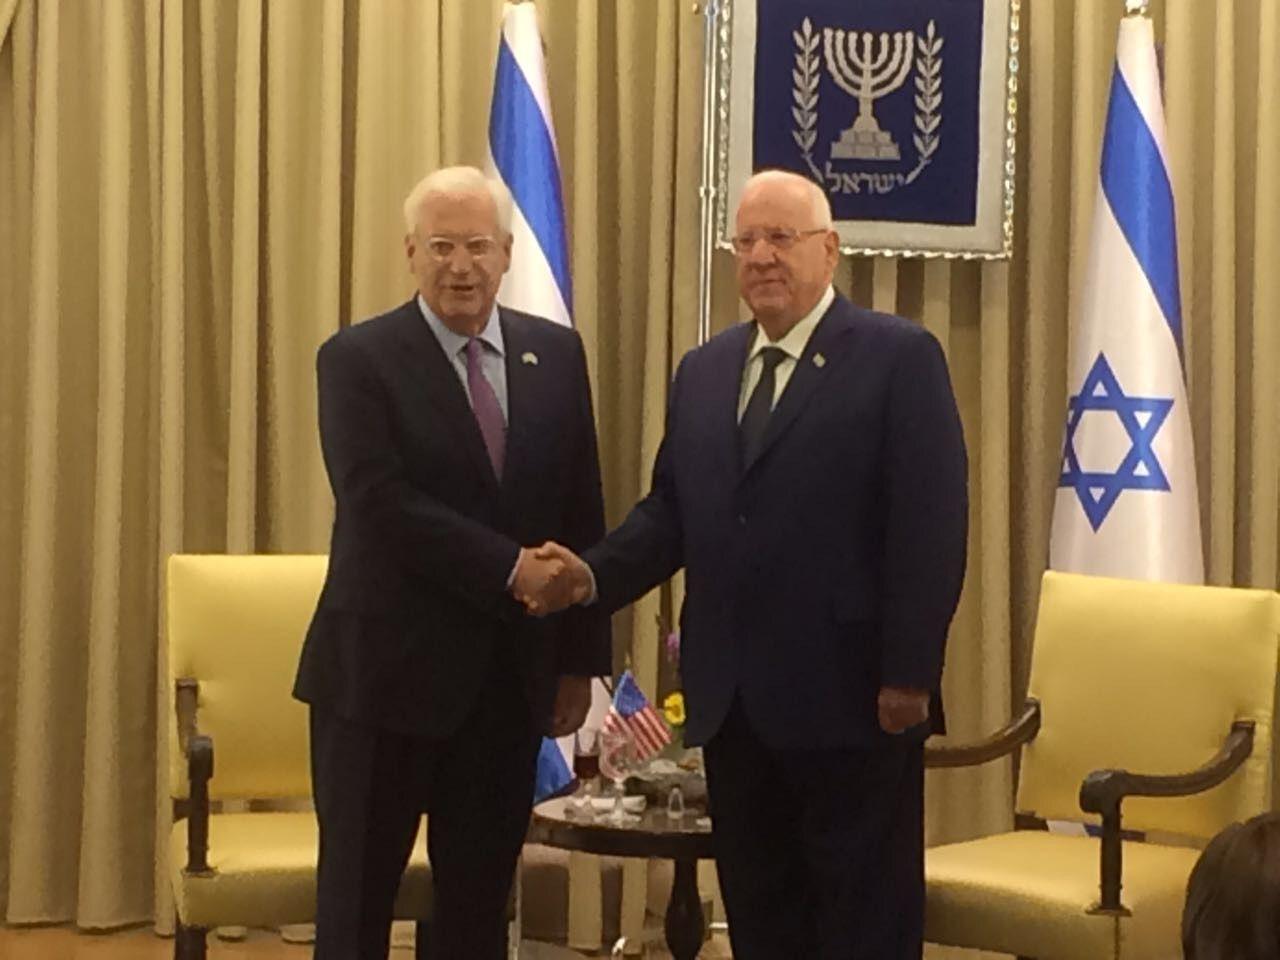 United States envoy David Friedman presents credentials to Israeli President Reuven Rivlin